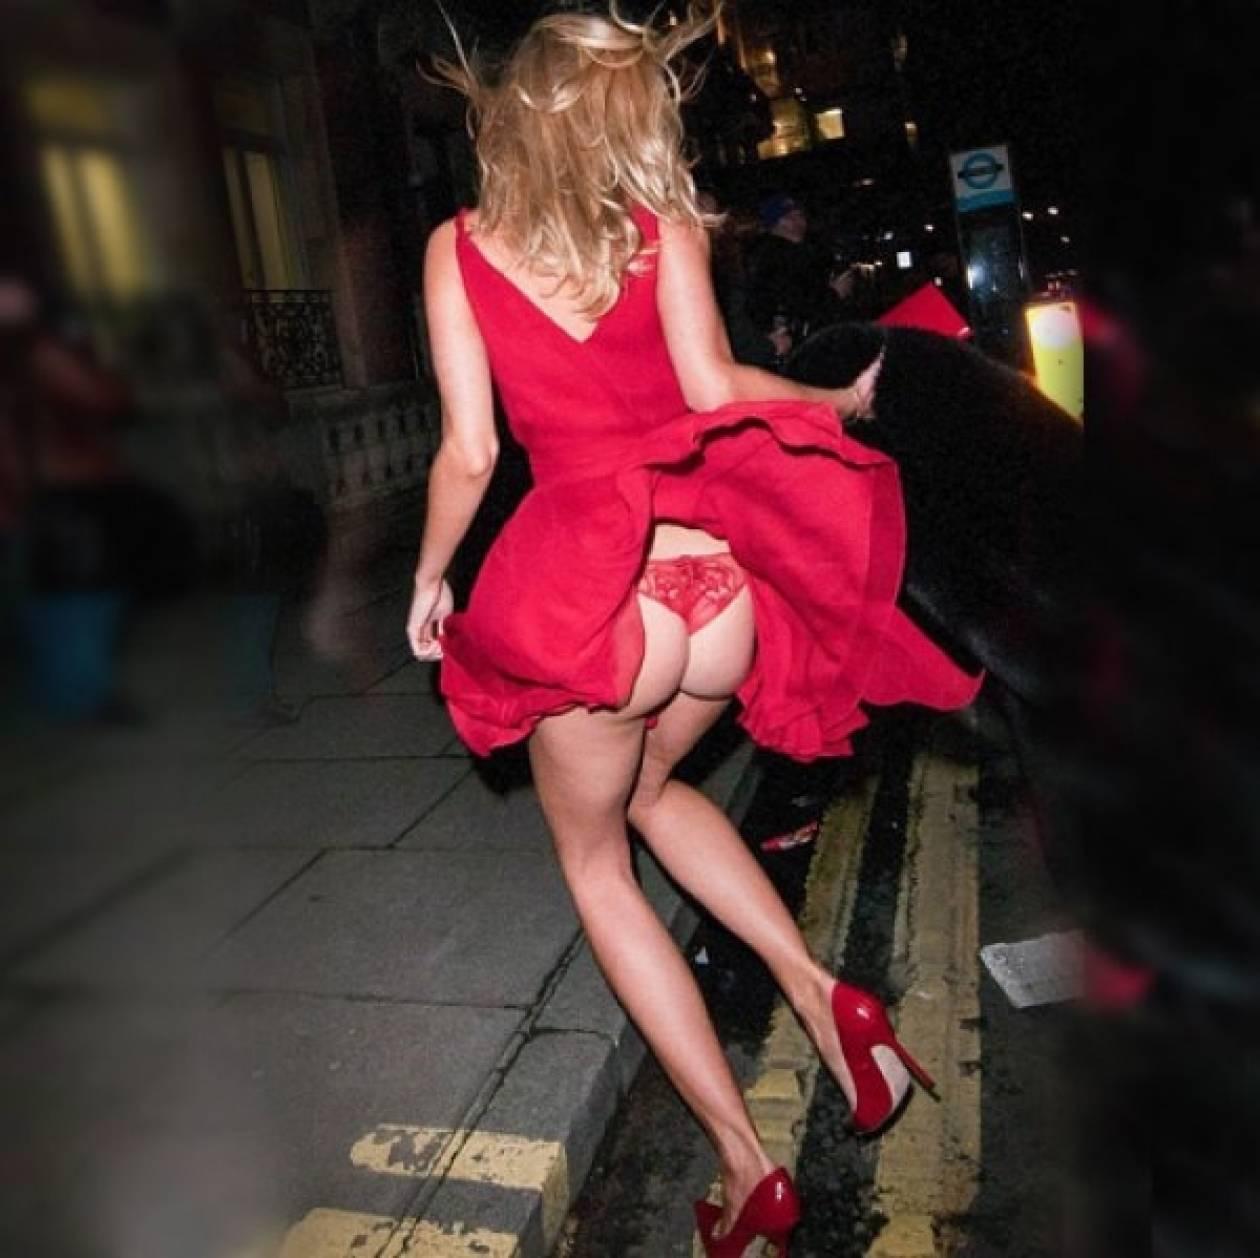 Sexy αποκάλυψη: Ποιας διάσημης το φόρεμα έβγαλε... φτερά;